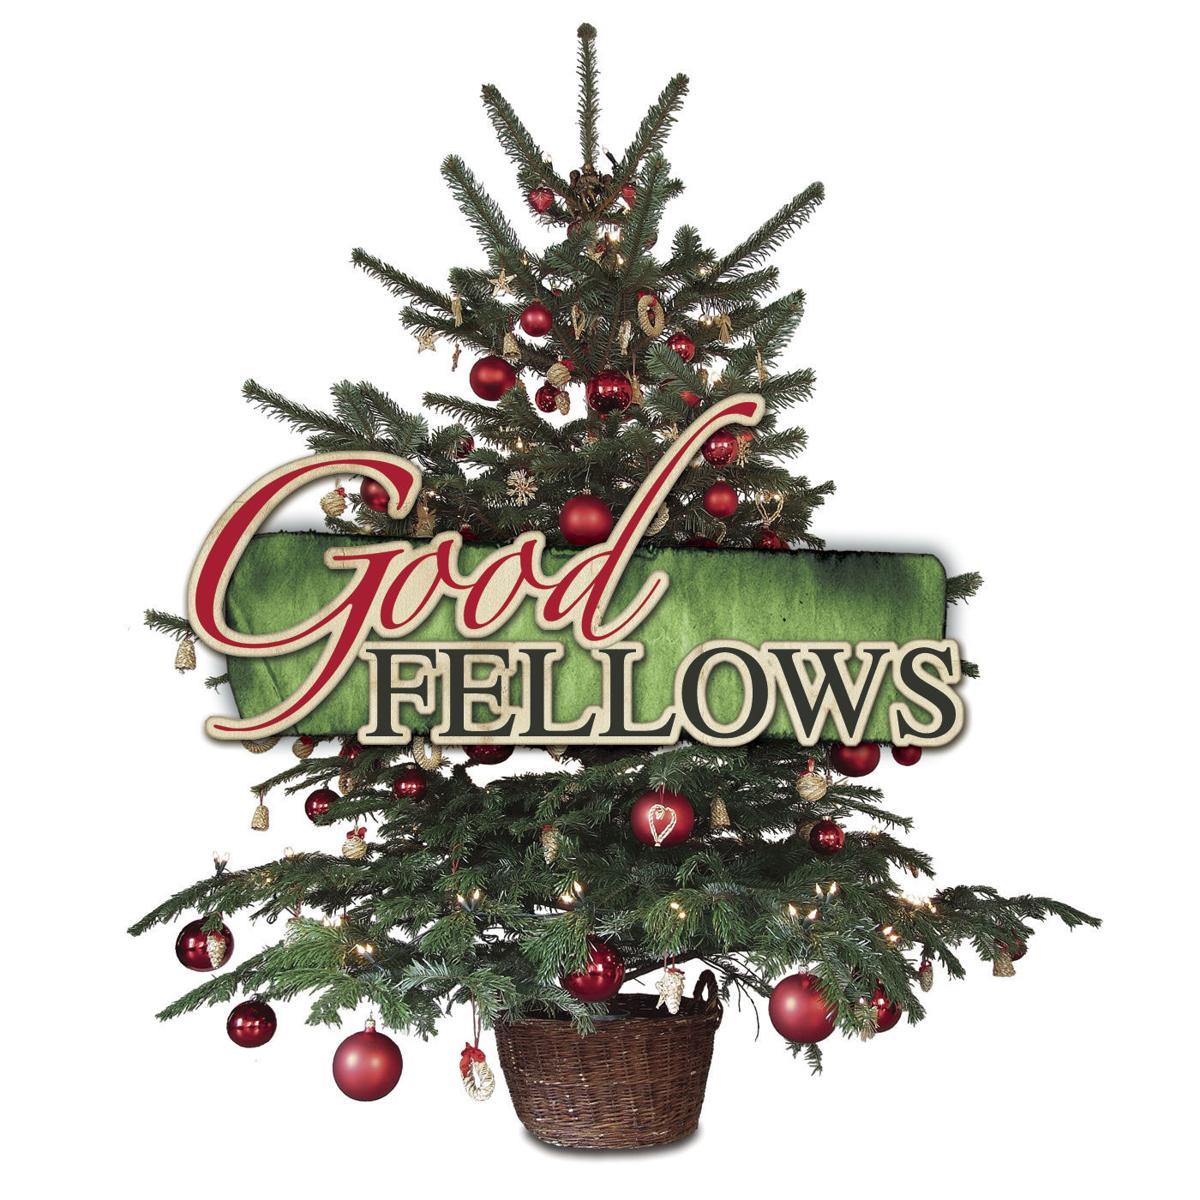 goodfellows graphic tree